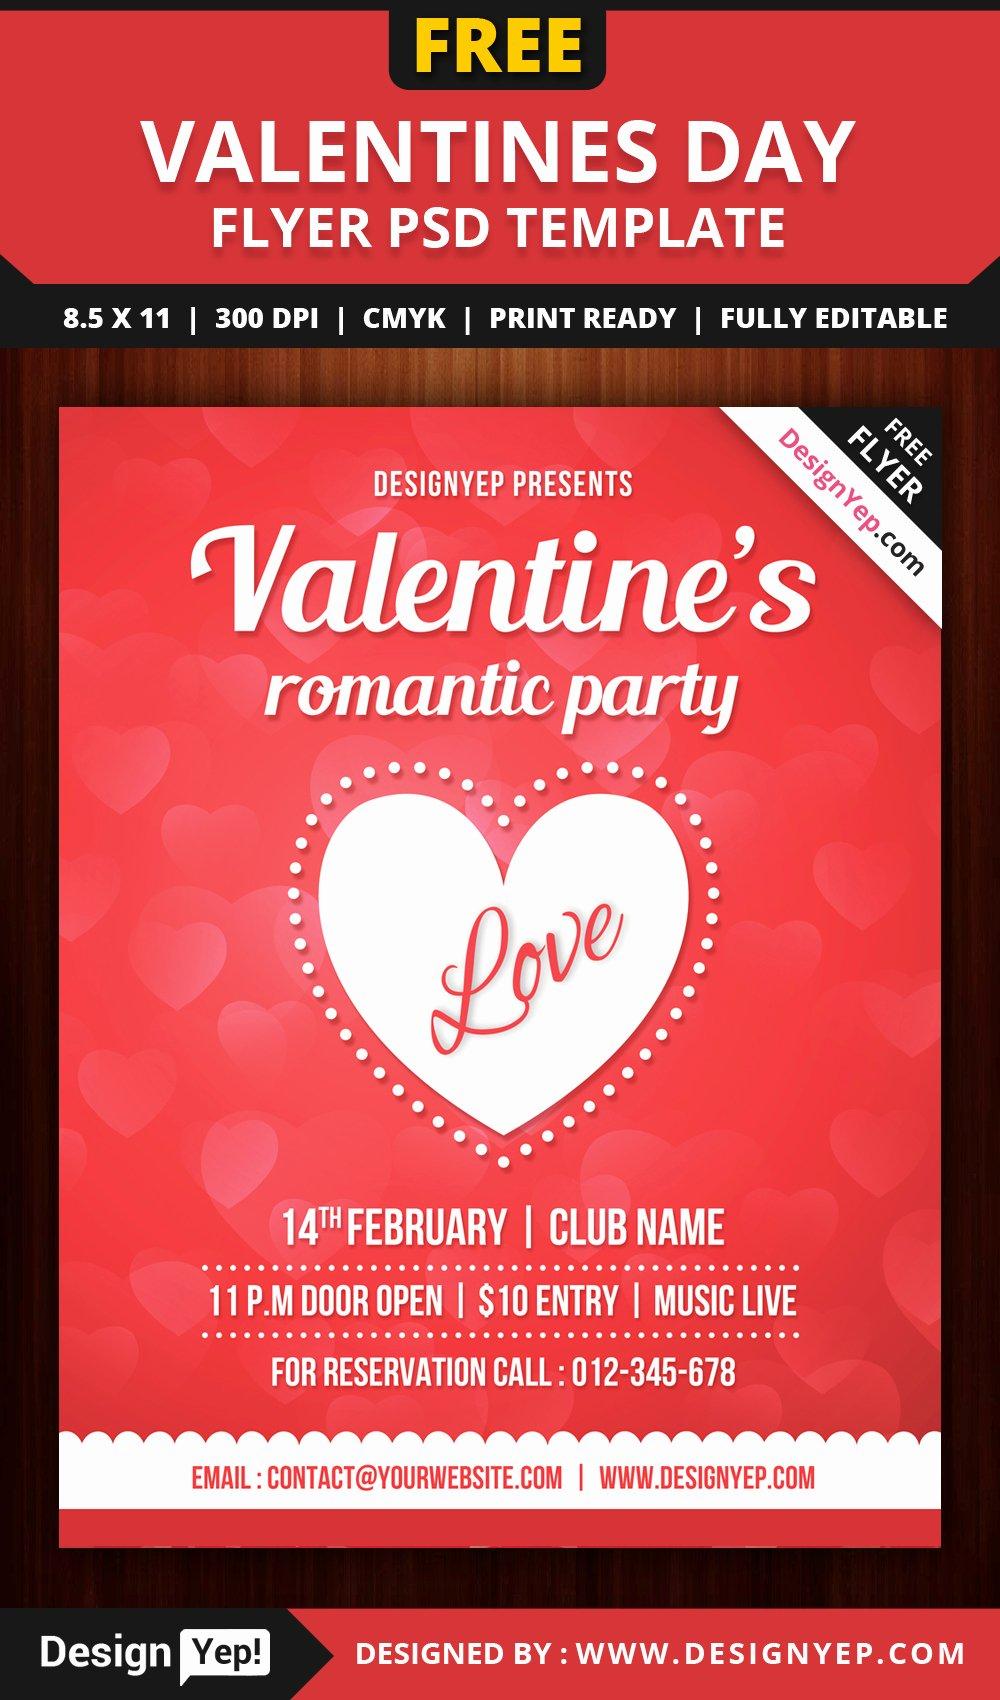 Free Valentines Party Flyer Template Psd Designyep